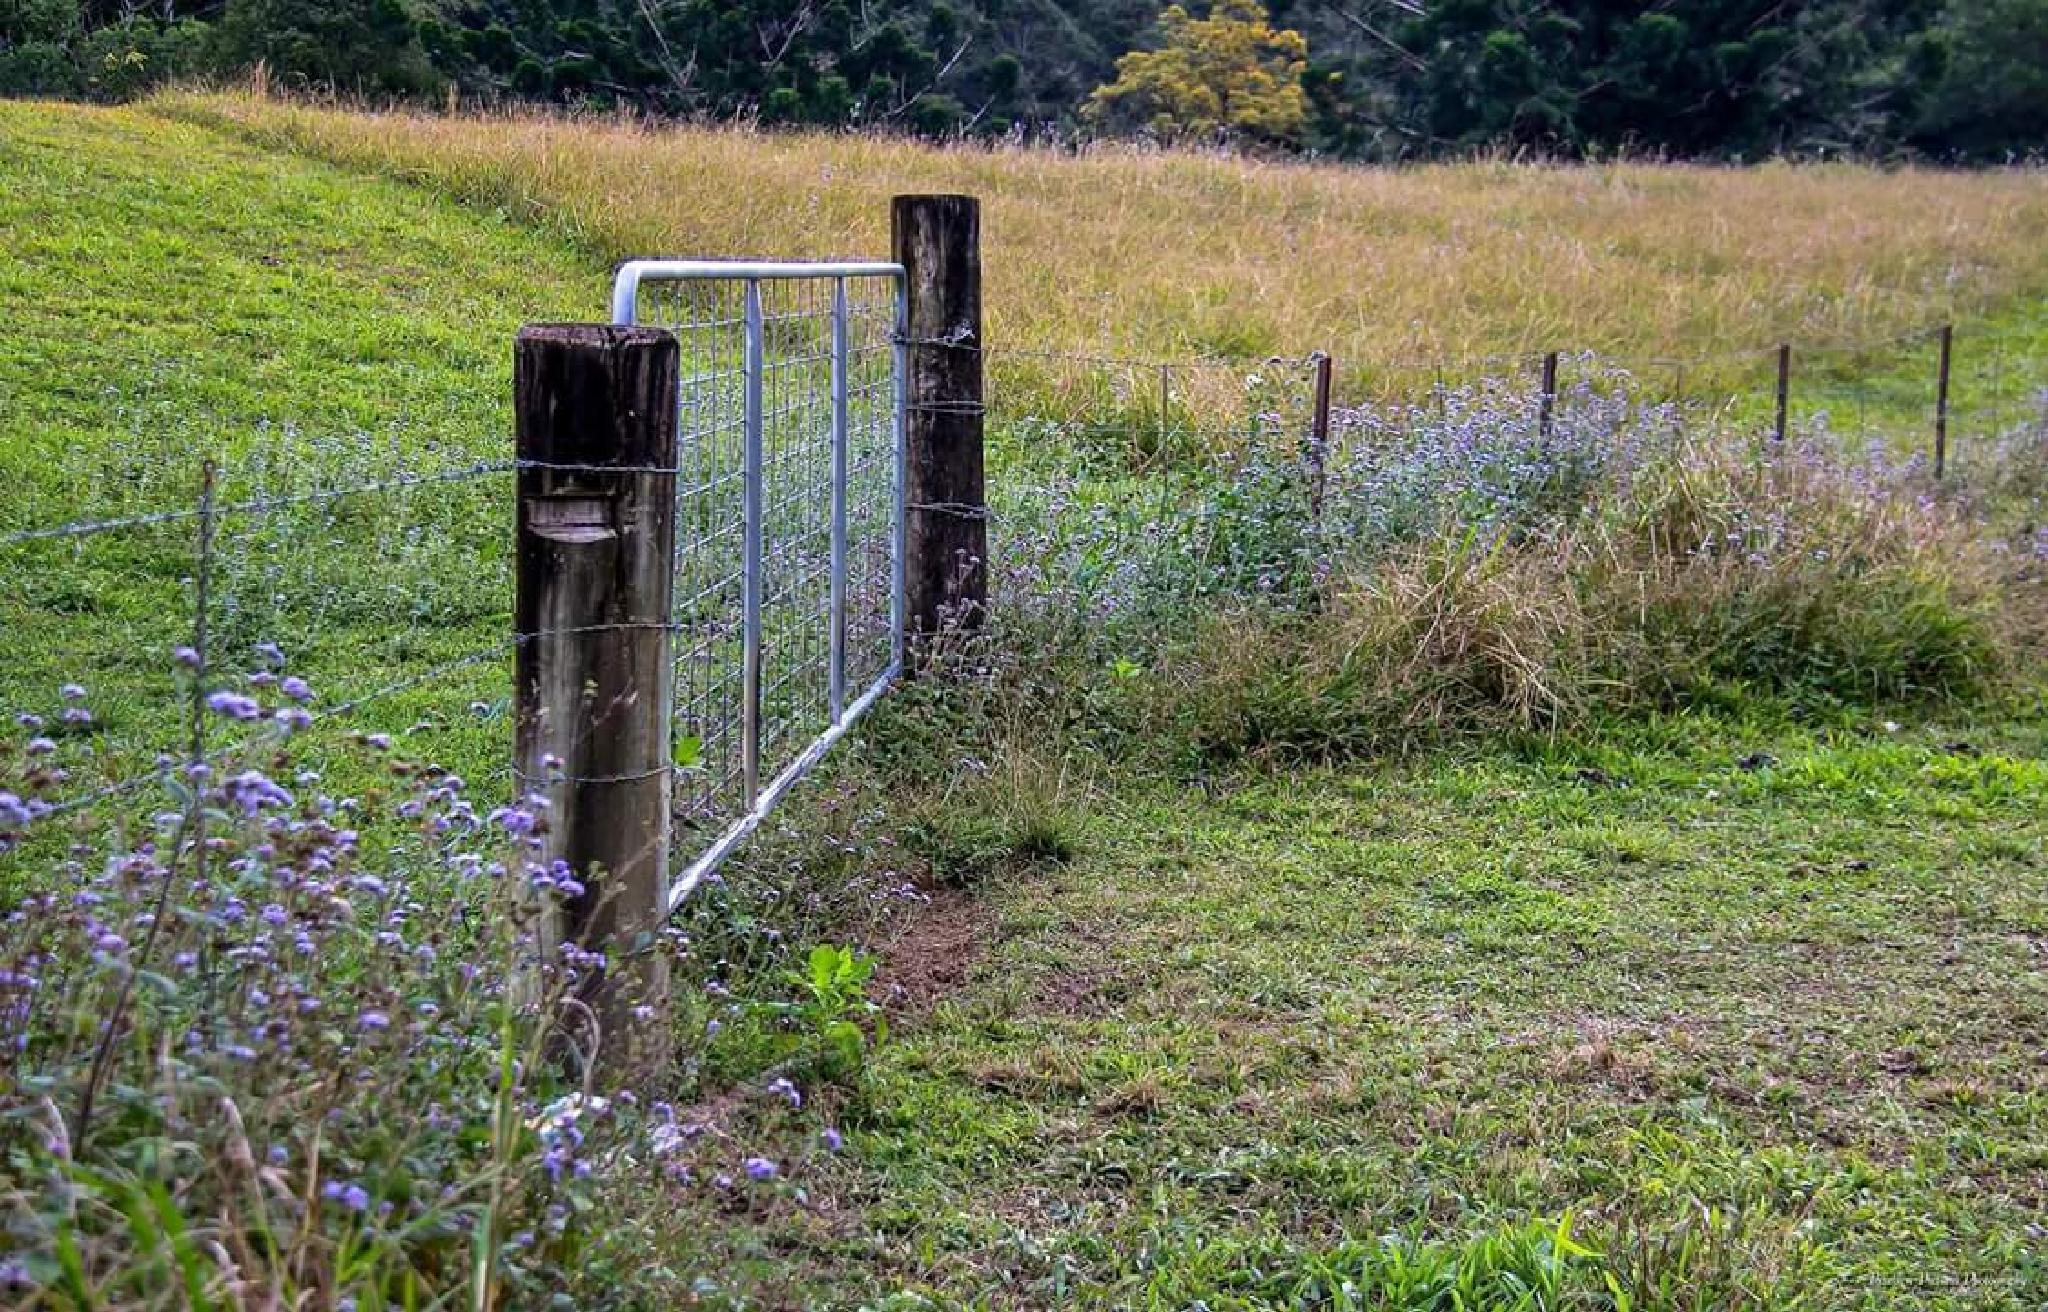 Shut the gate #iloveaustralia #aussiephotos #exploringaustralia #signatureshots_hub by wombatdreaming